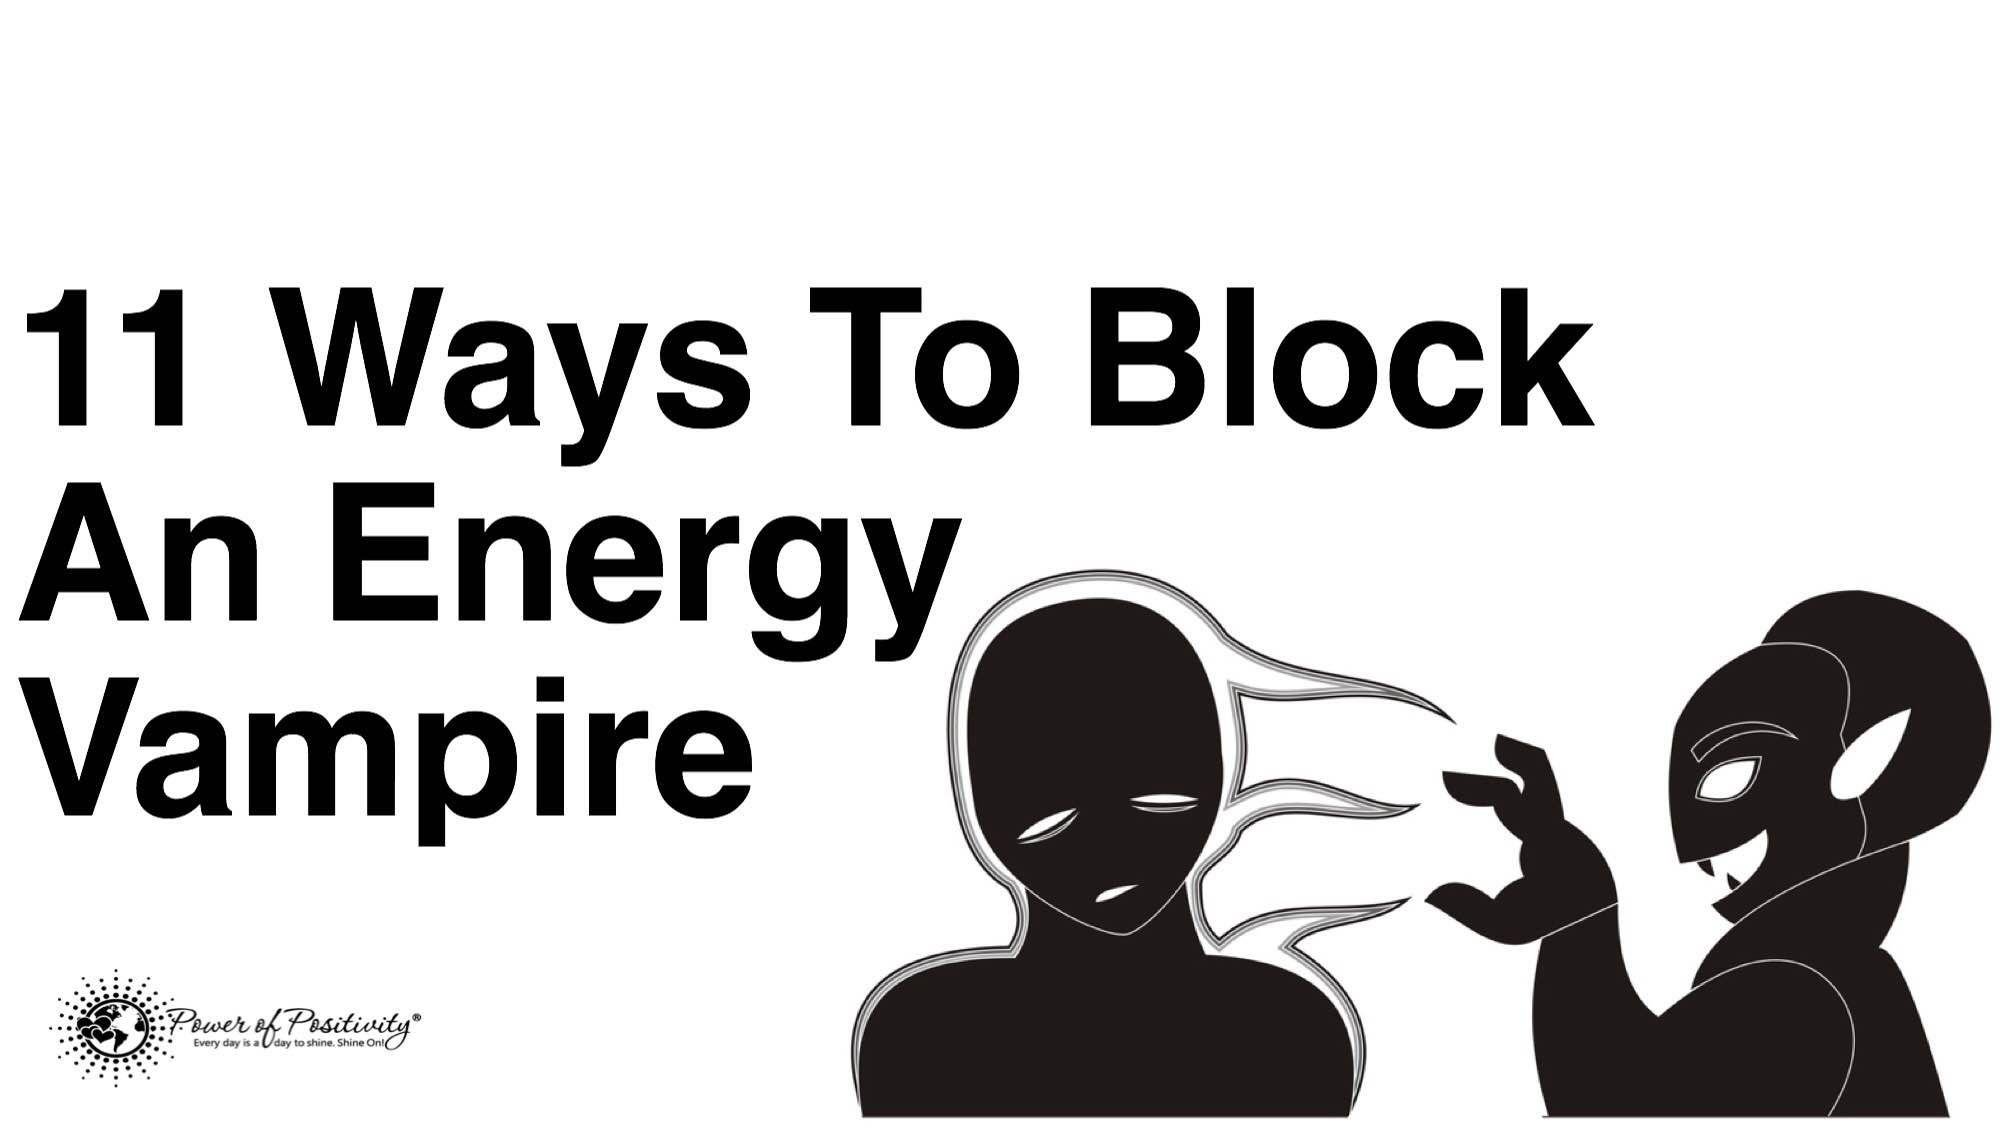 11 Ways To Block An Energy Vampire